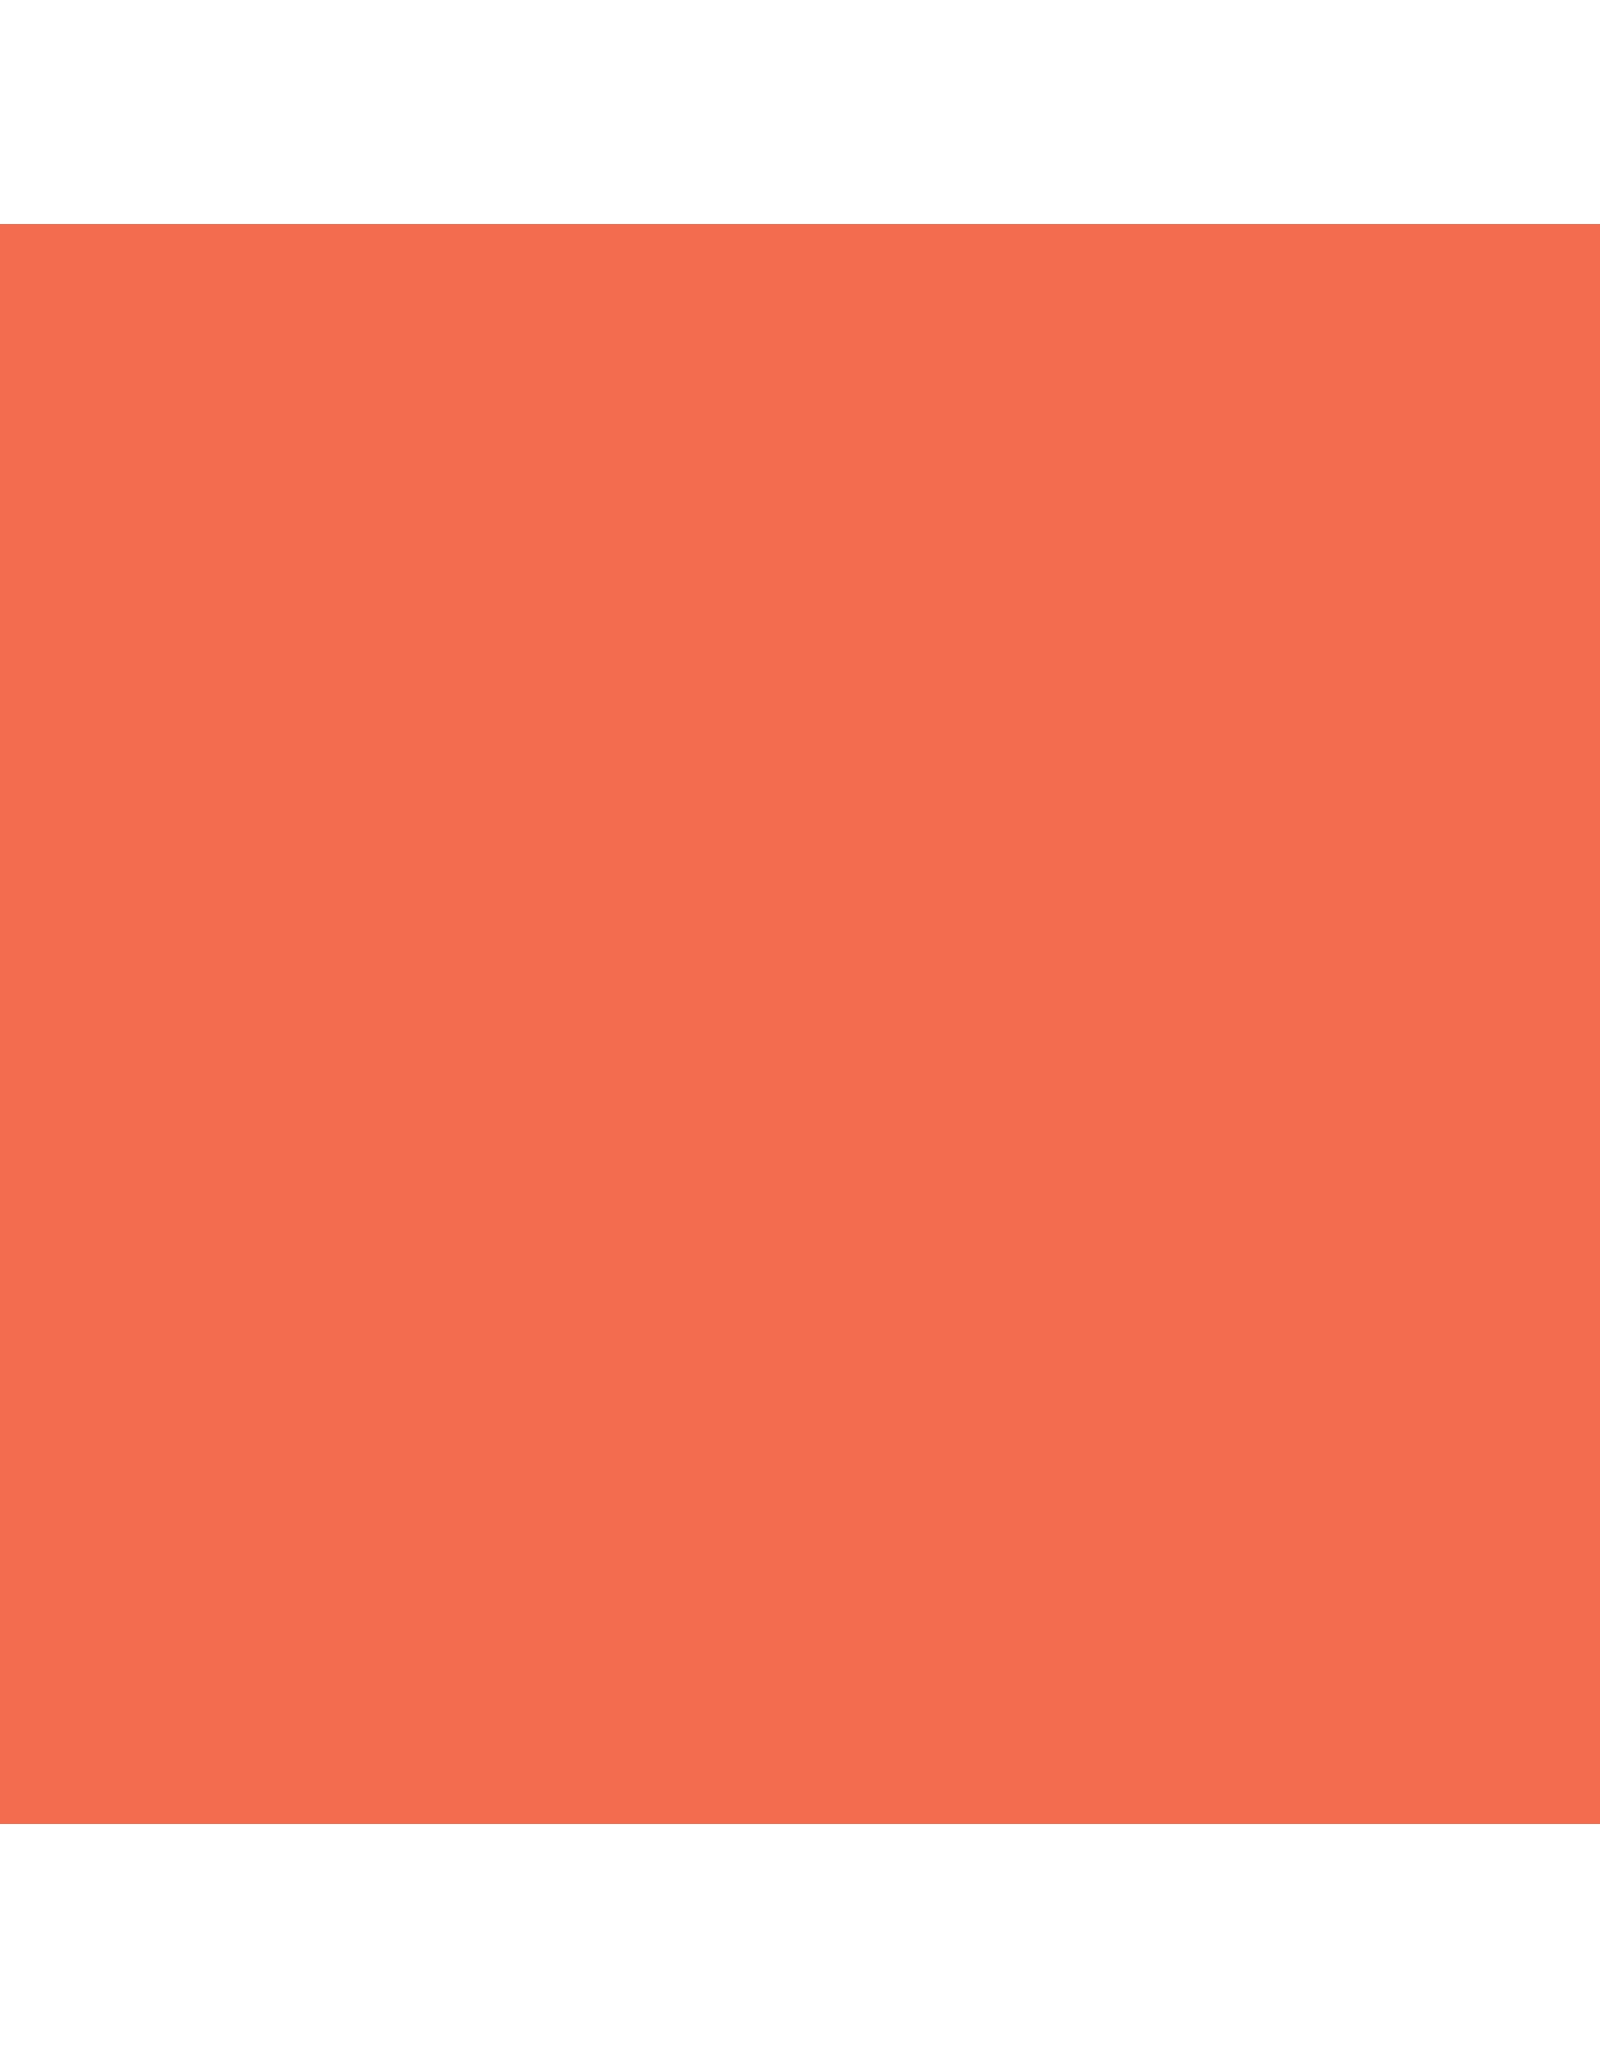 Andover Fabrics Century Solids, Coral Sunset, Fabric Half-Yards CS-10